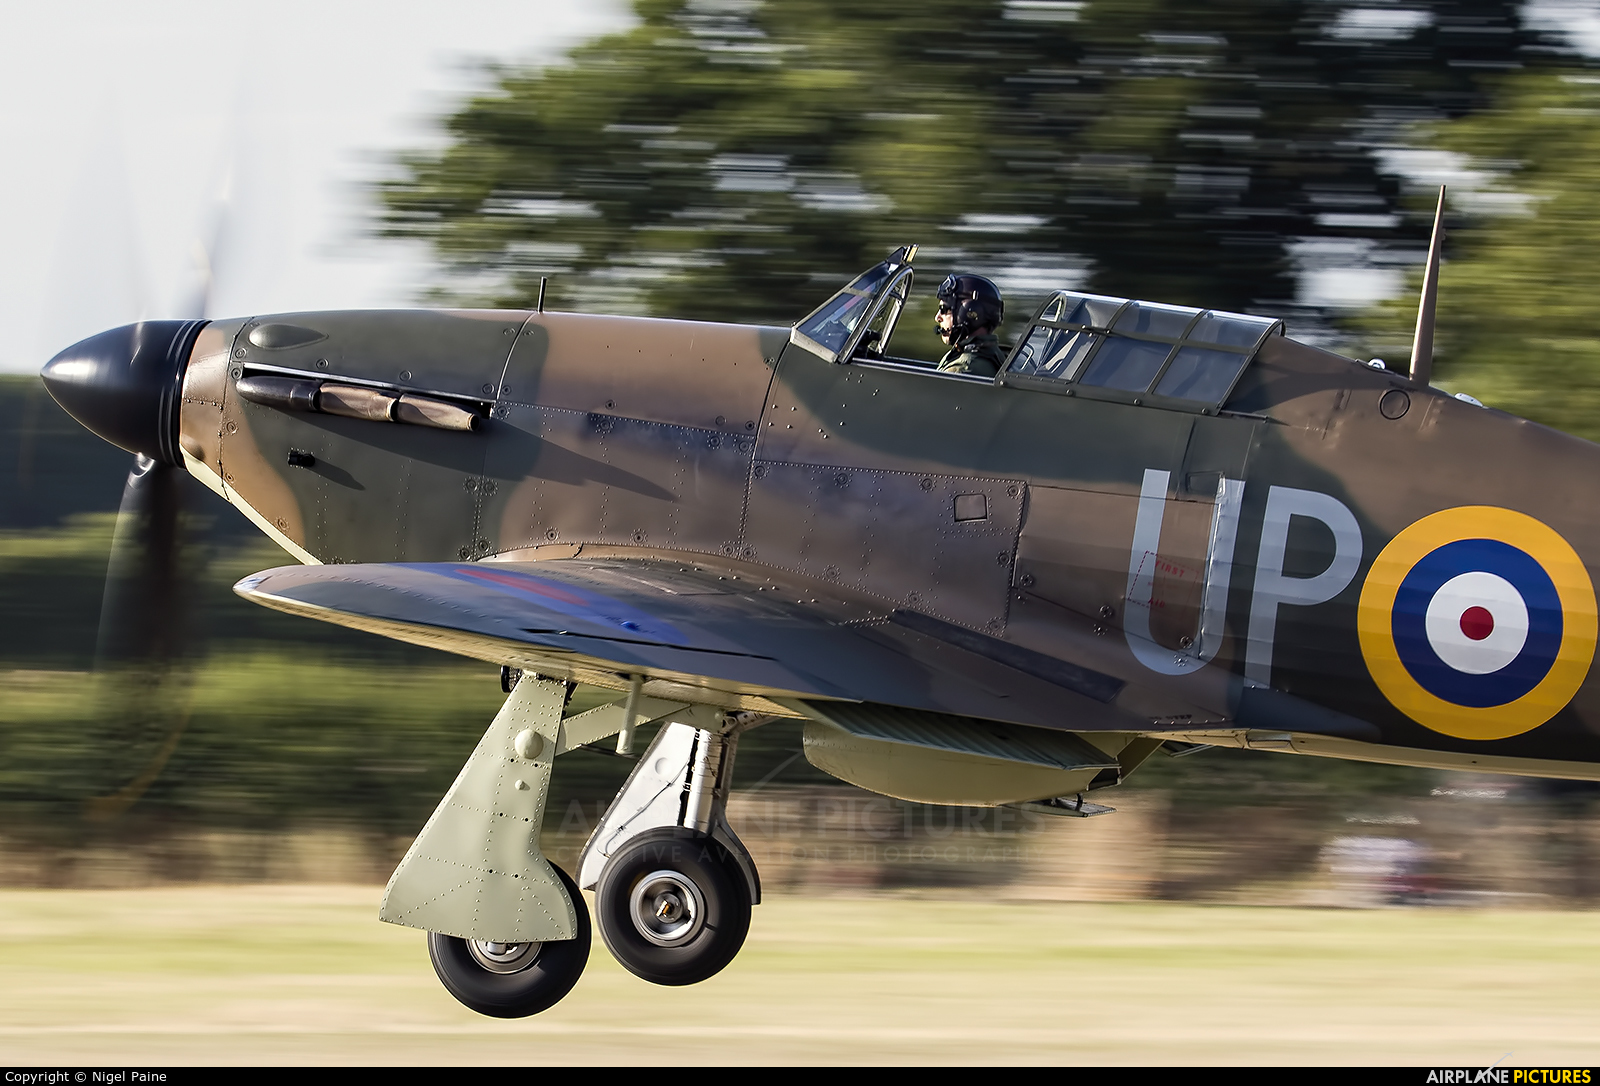 Private G-HUPW aircraft at Lashenden / Headcorn